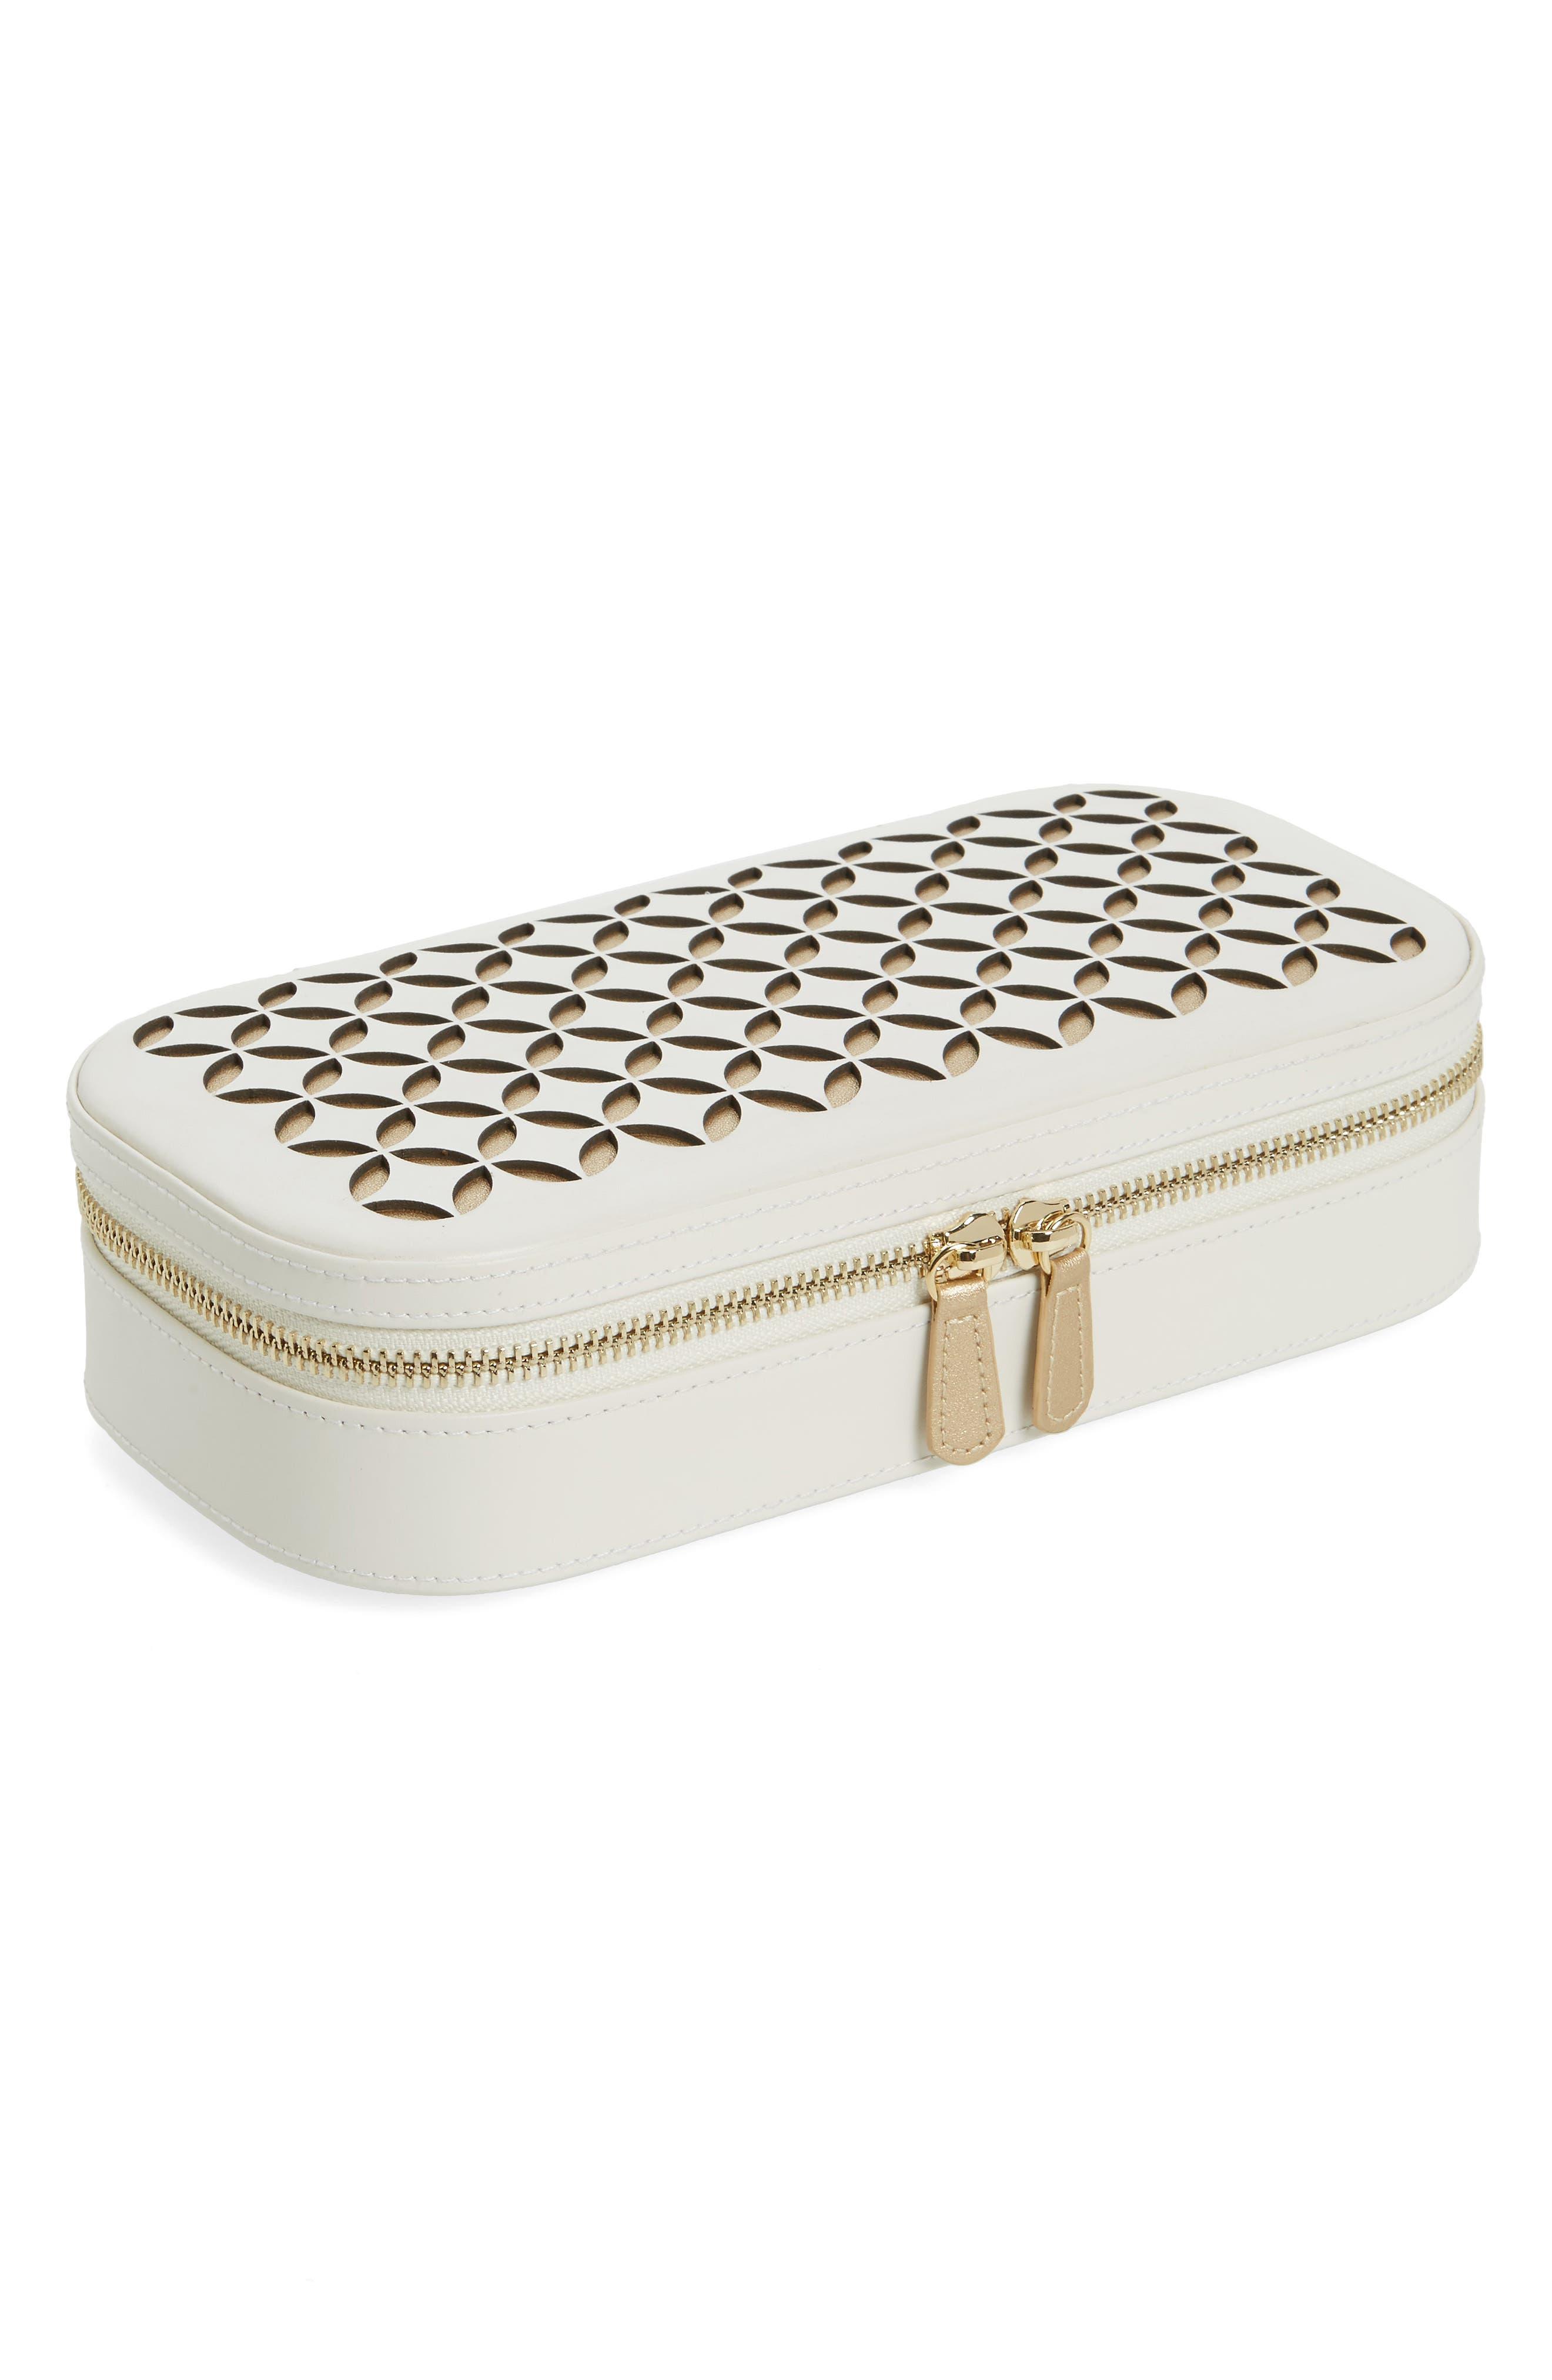 Chloe Zip Jewelry Case,                         Main,                         color, Ivory